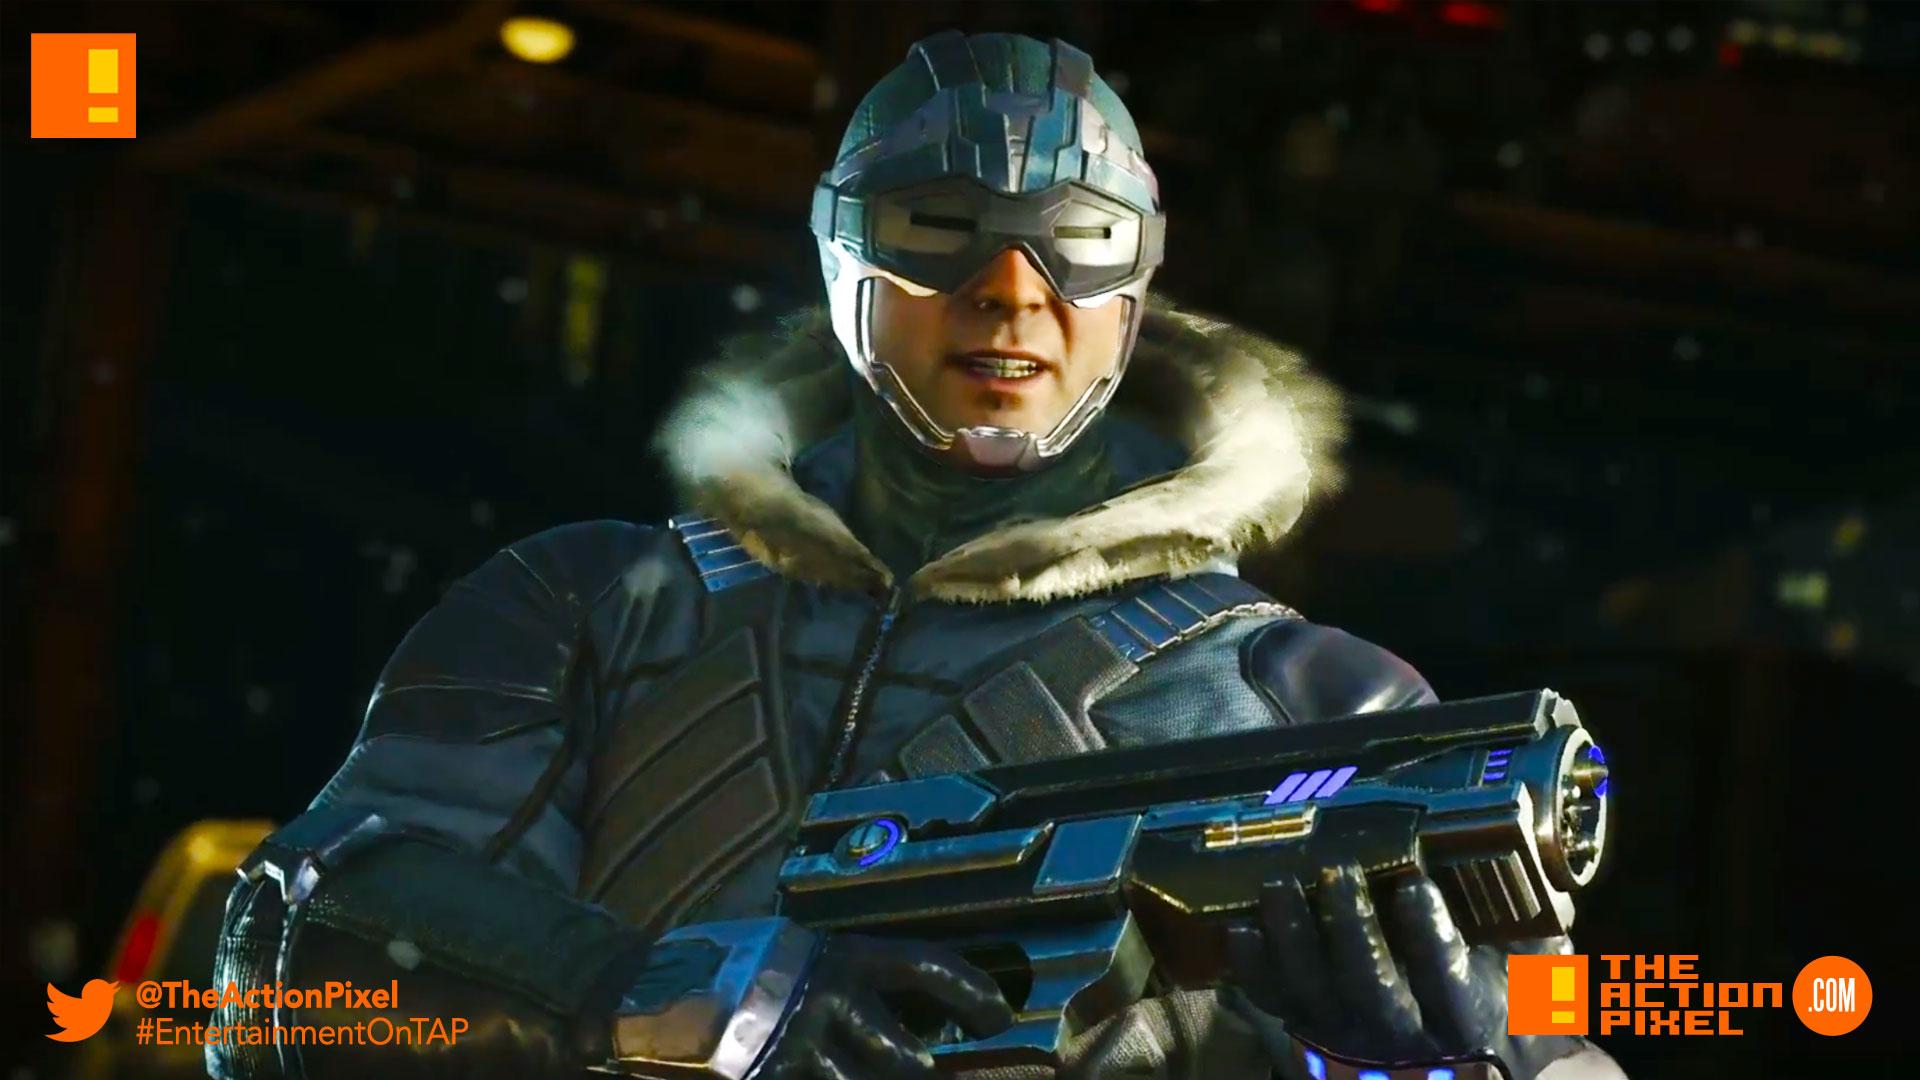 captain cold, injustice 2, the action pixel, netherrealm studios, wb games, dc comics, warner bros,